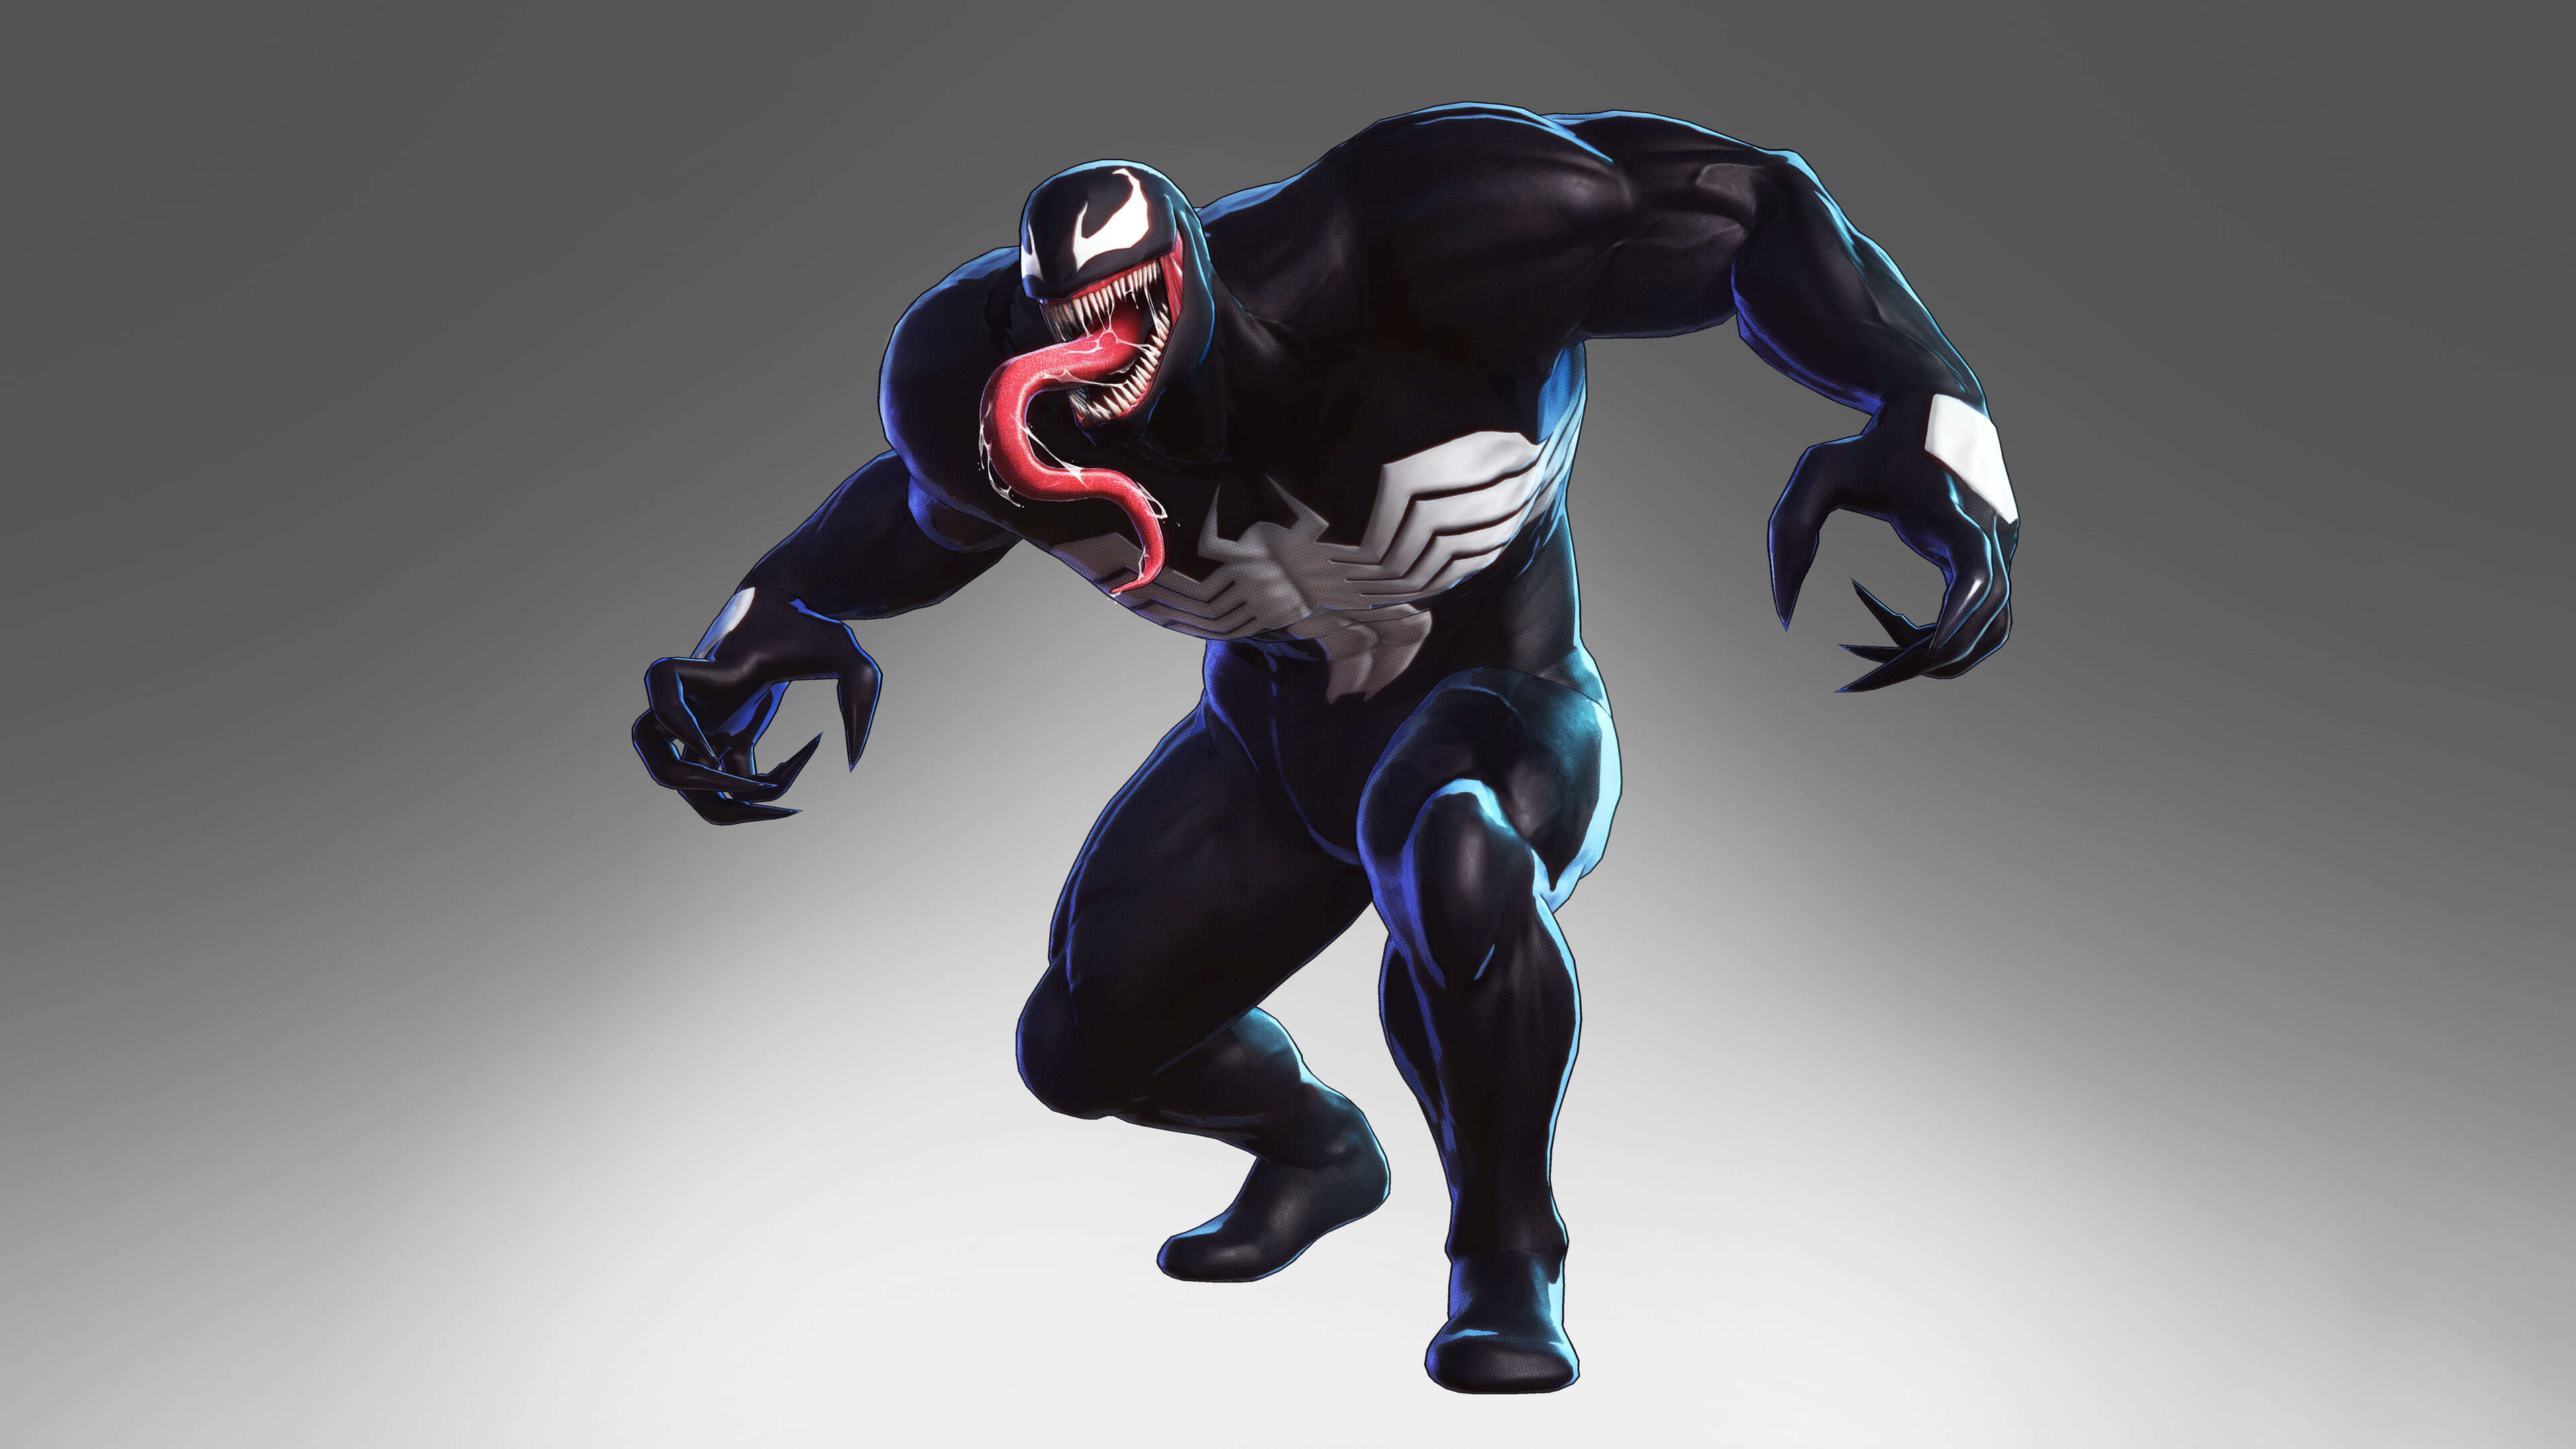 Marvel Ultimate Alliance 3 Venom Uhd 4k Wallpaper Pixelz